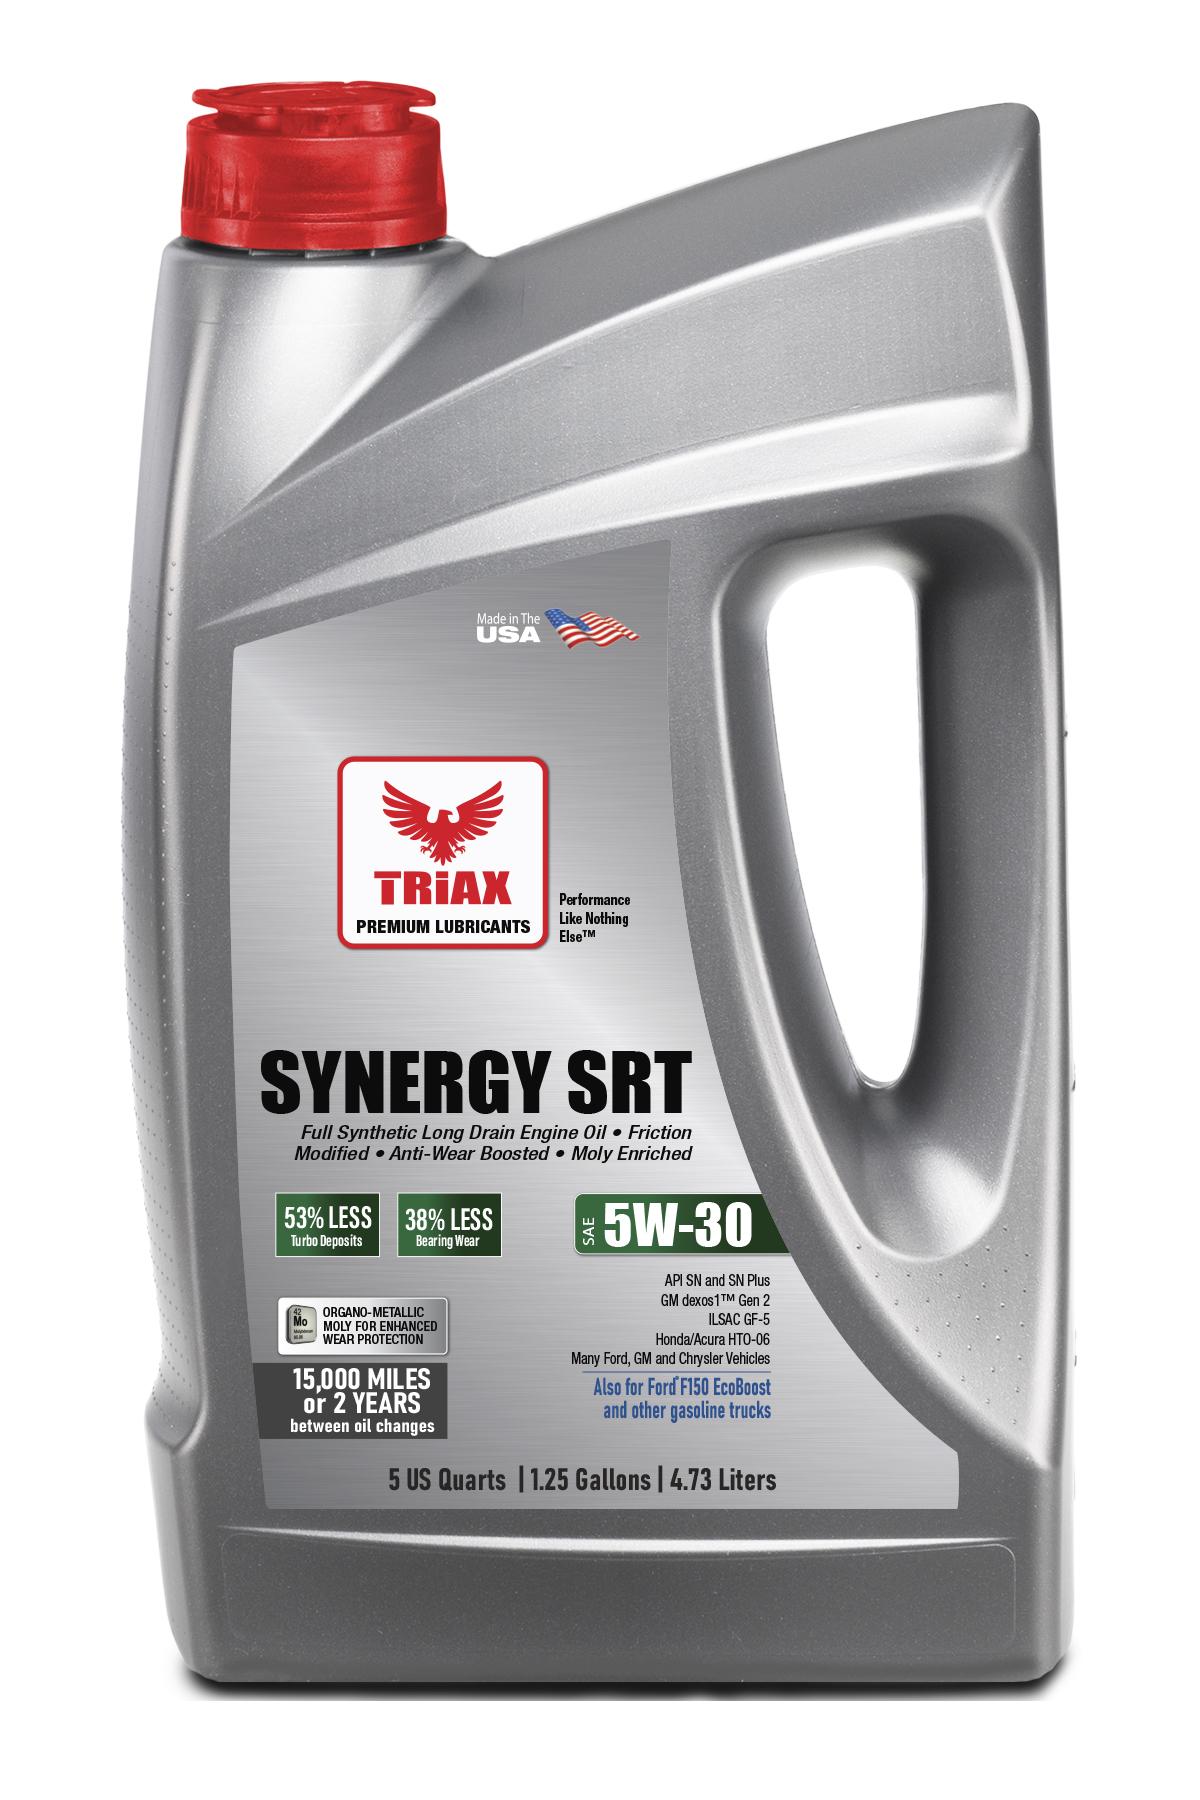 TRIAX Synergy SRT 5W-30 Full Synthetic DEXOS